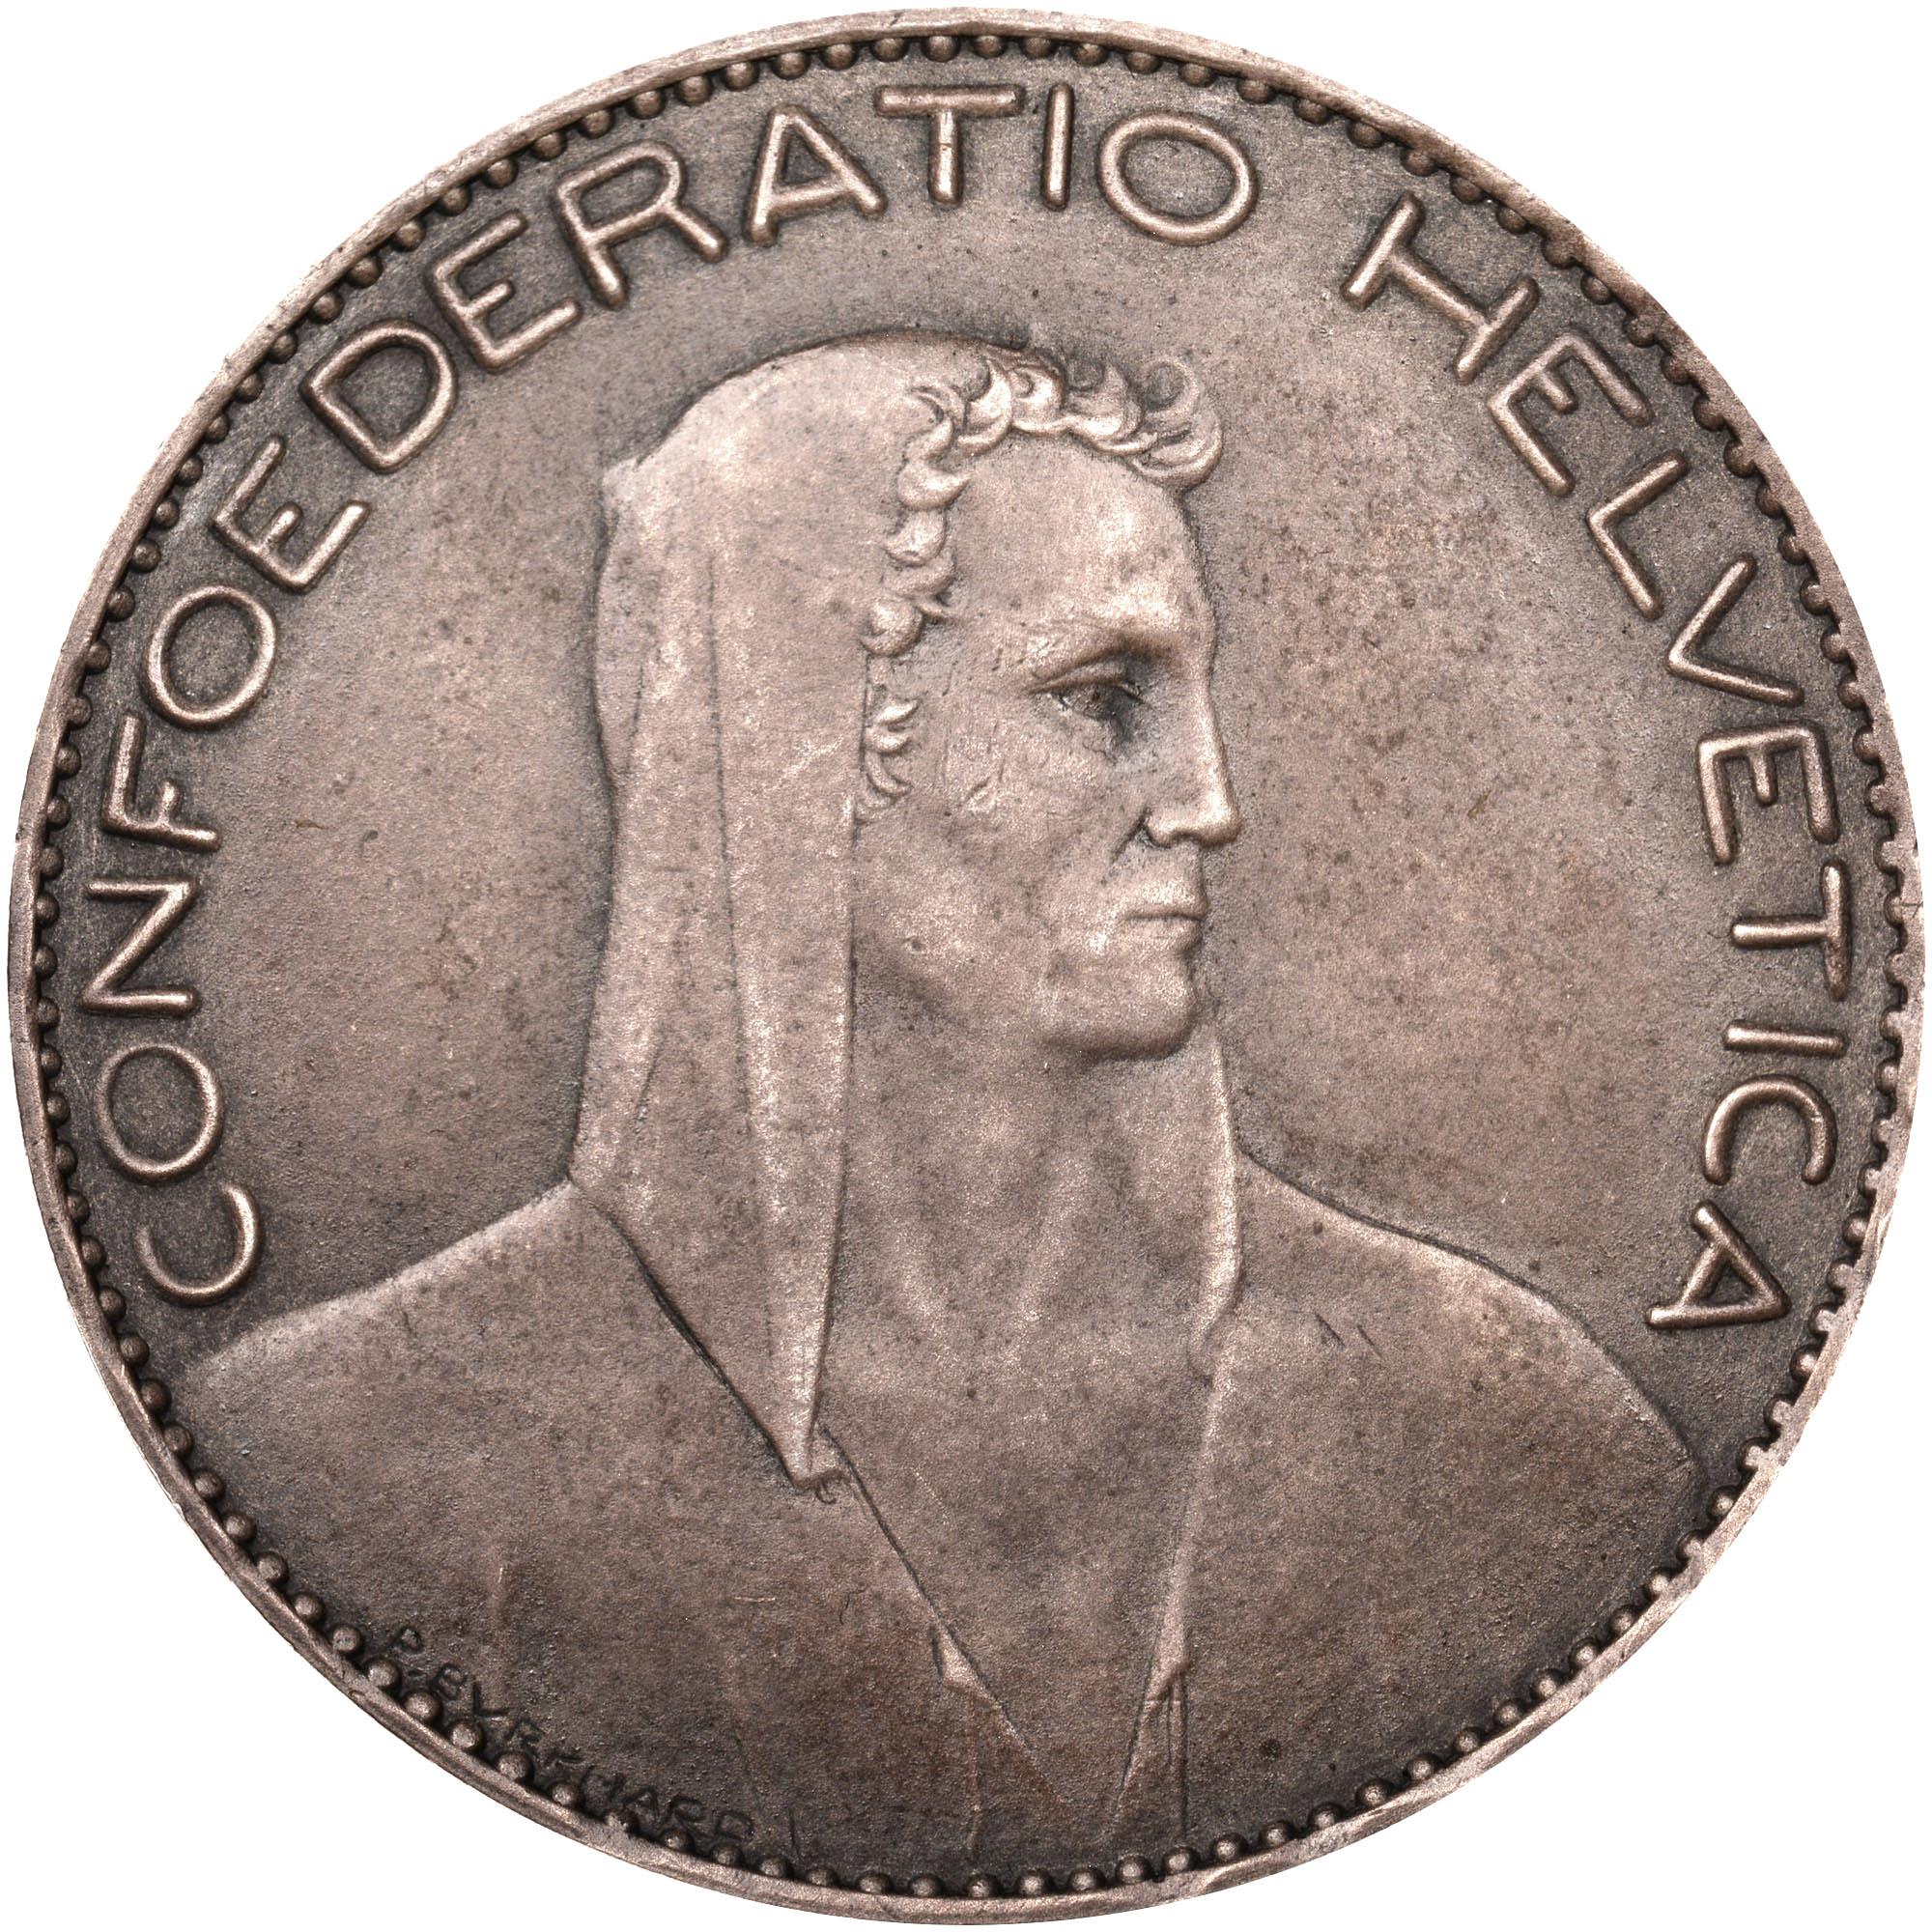 1922-1923 Switzerland 5 Francs obverse